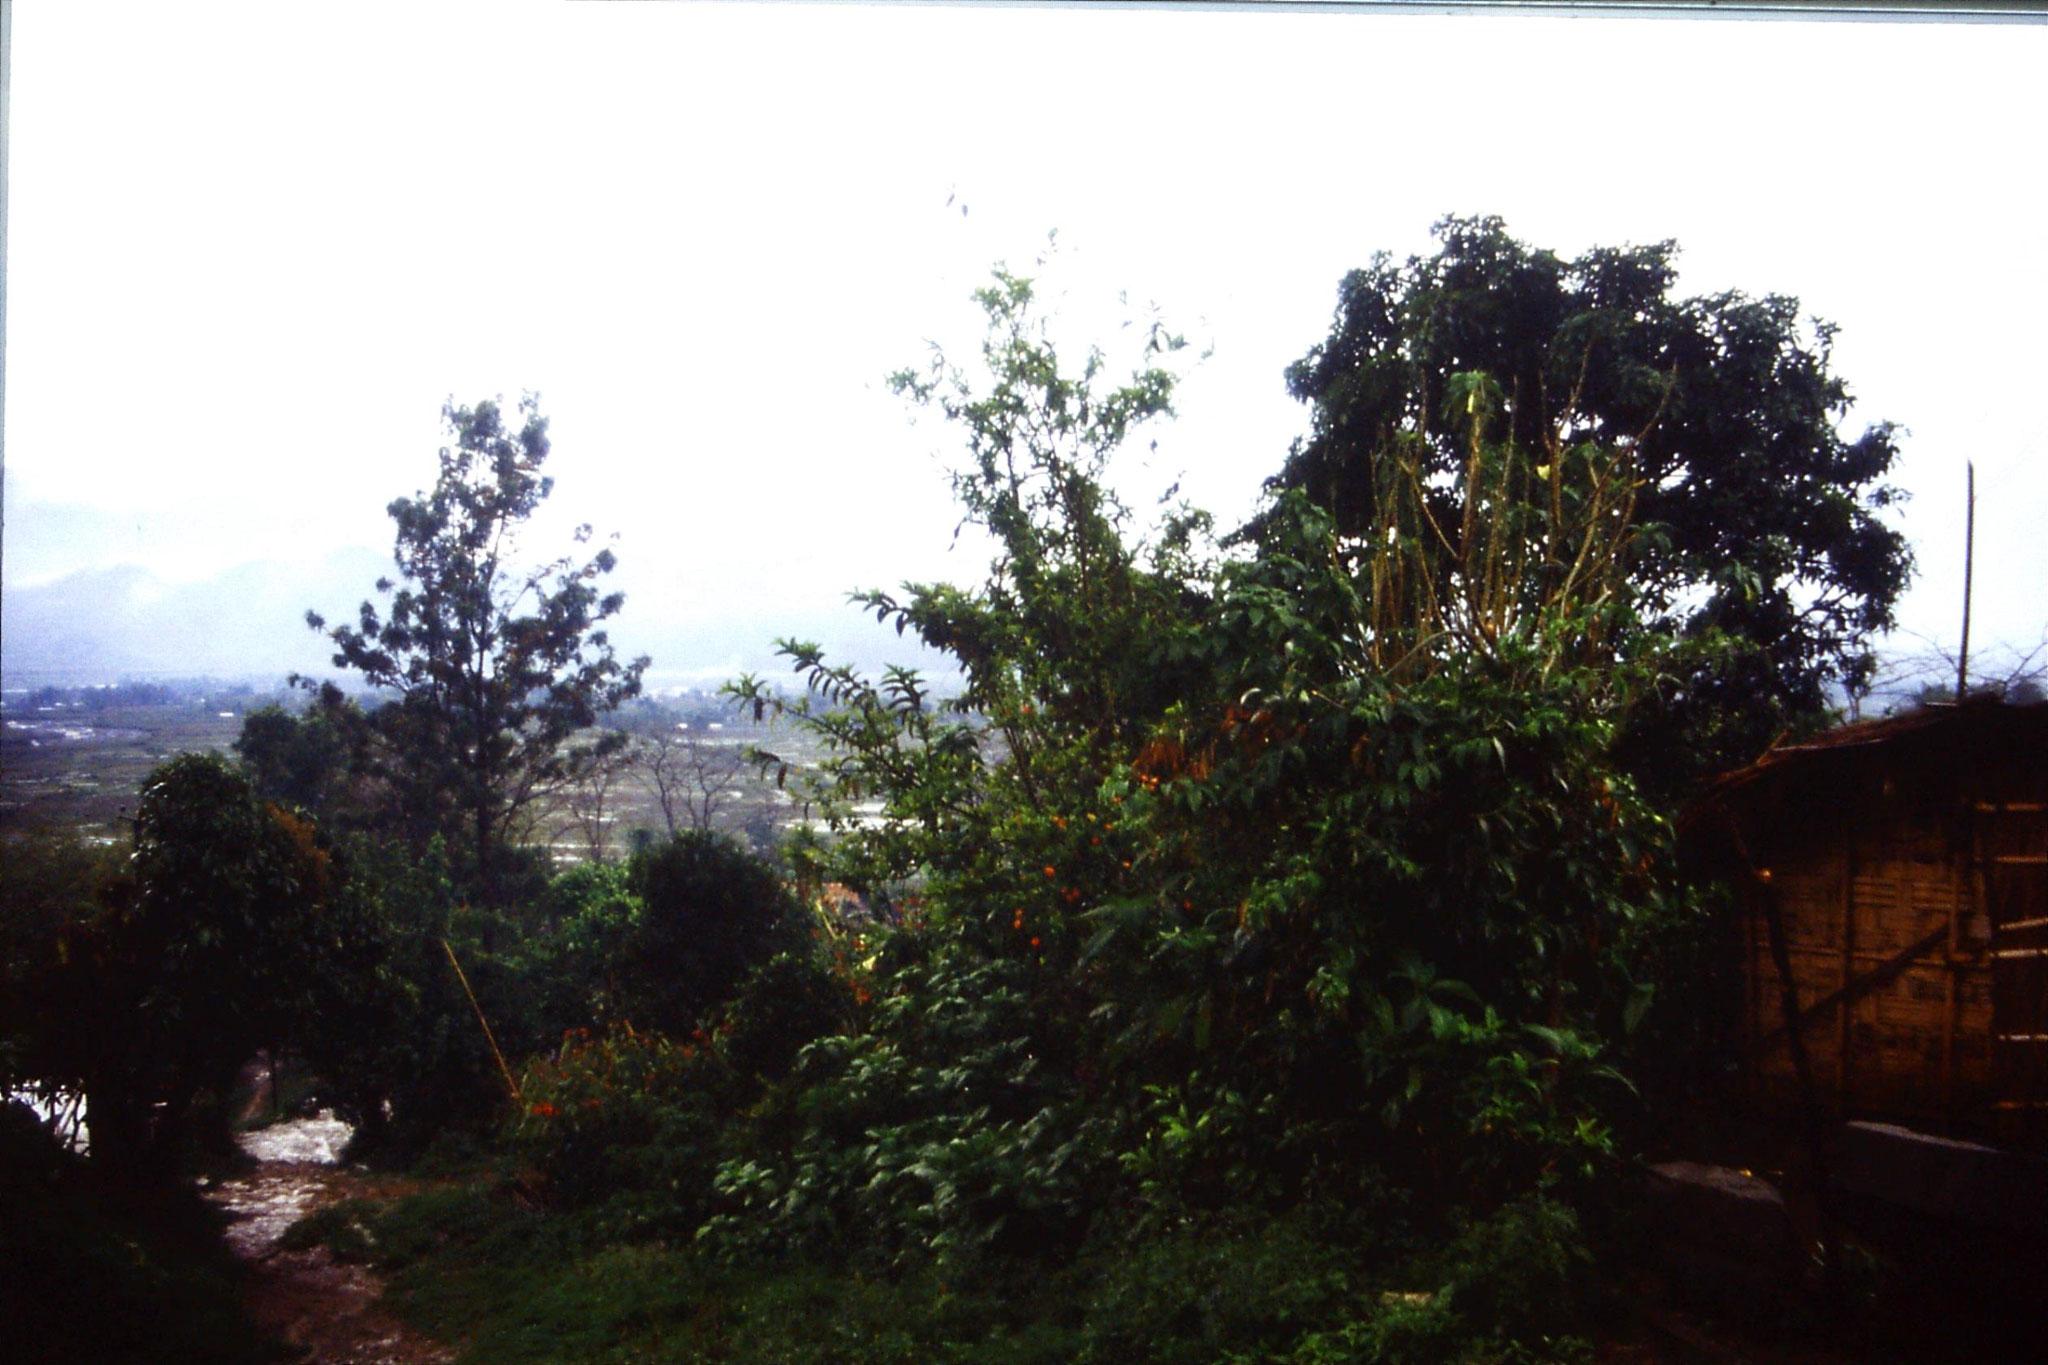 113/29: Makhran village